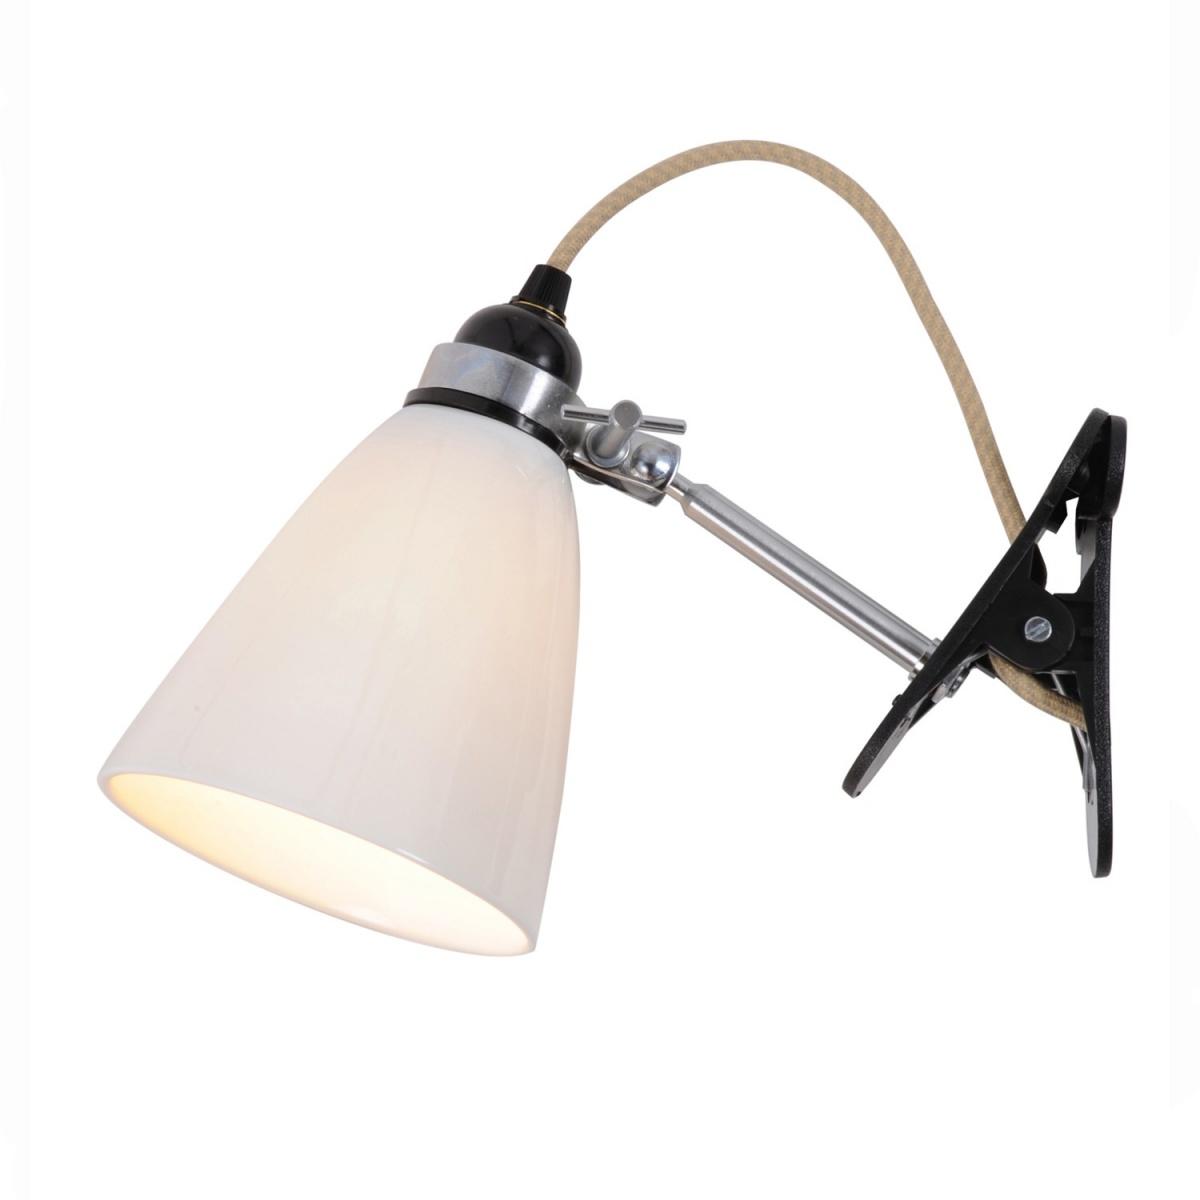 Lampa ścienna Hector Medium Dome Clip BTC